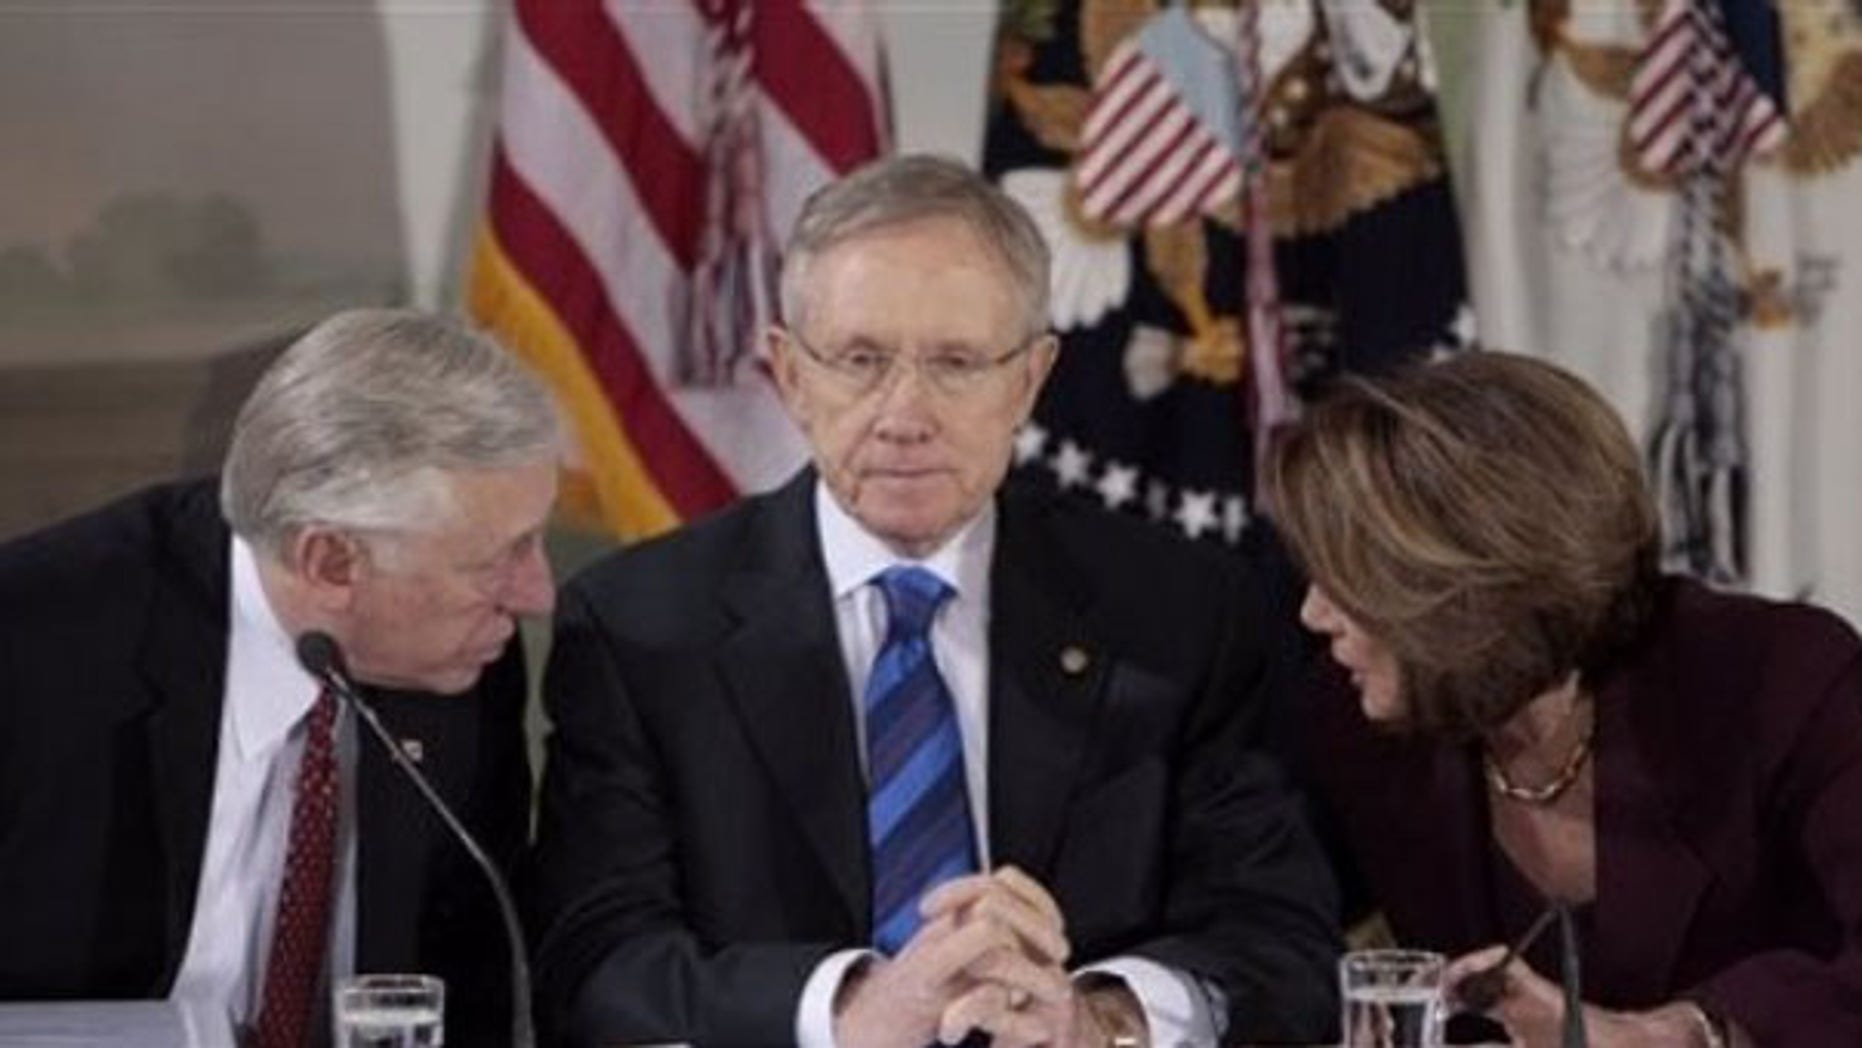 Senate Majority Leader Harry Reid, center, listens as House Majority Leader Steny Hoyer, left, talks to House Speaker Nancy Pelosi at a health care reform meeting Feb. 25 in Washington. (AP Photo)